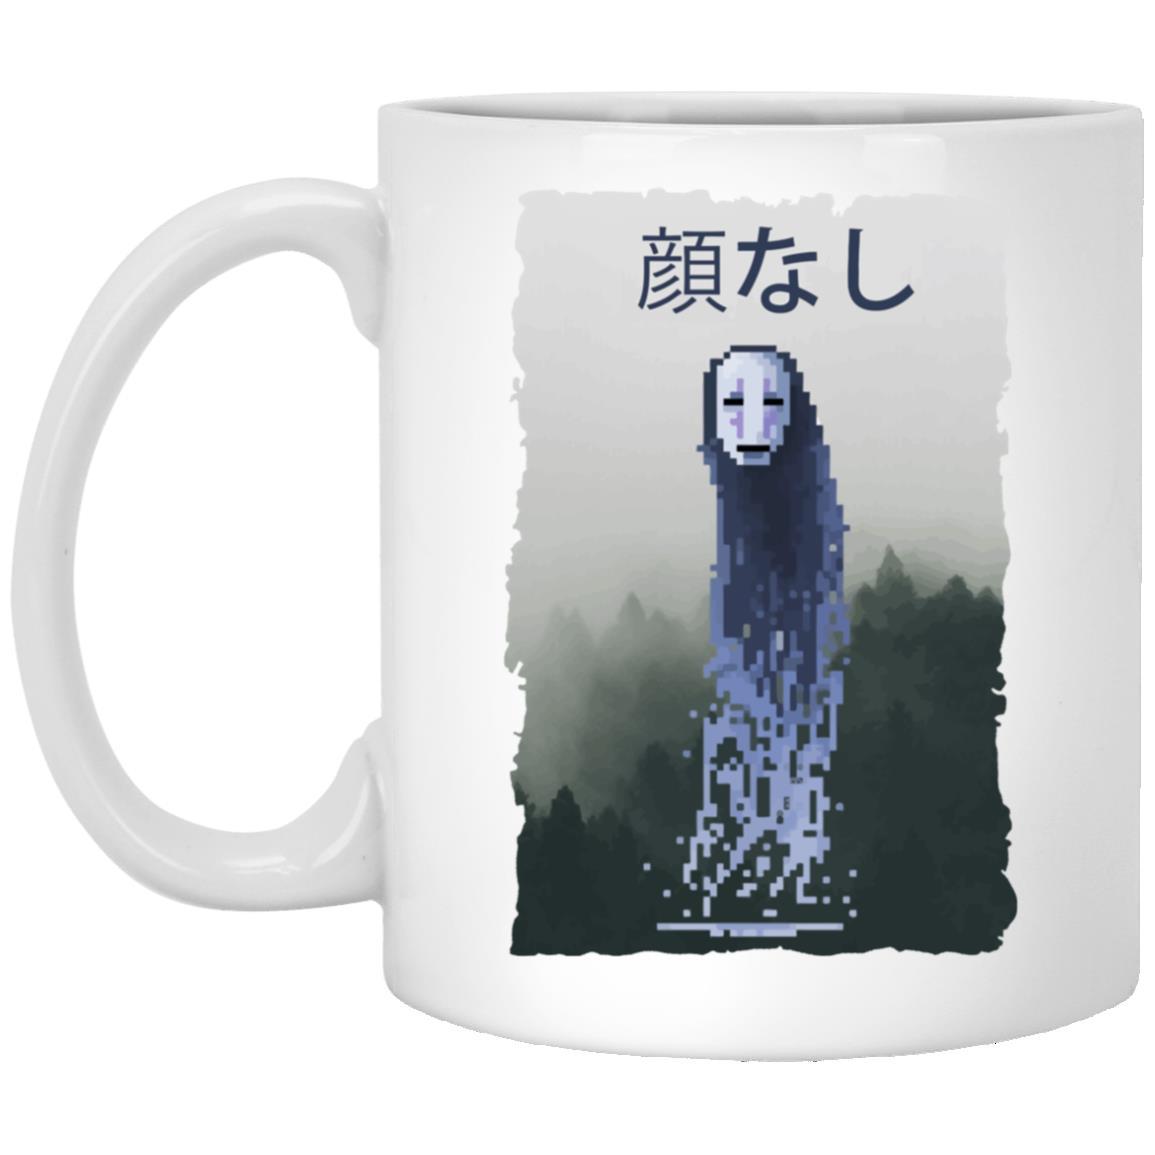 Spirited Away No Face Kaonashi 8bit Mug